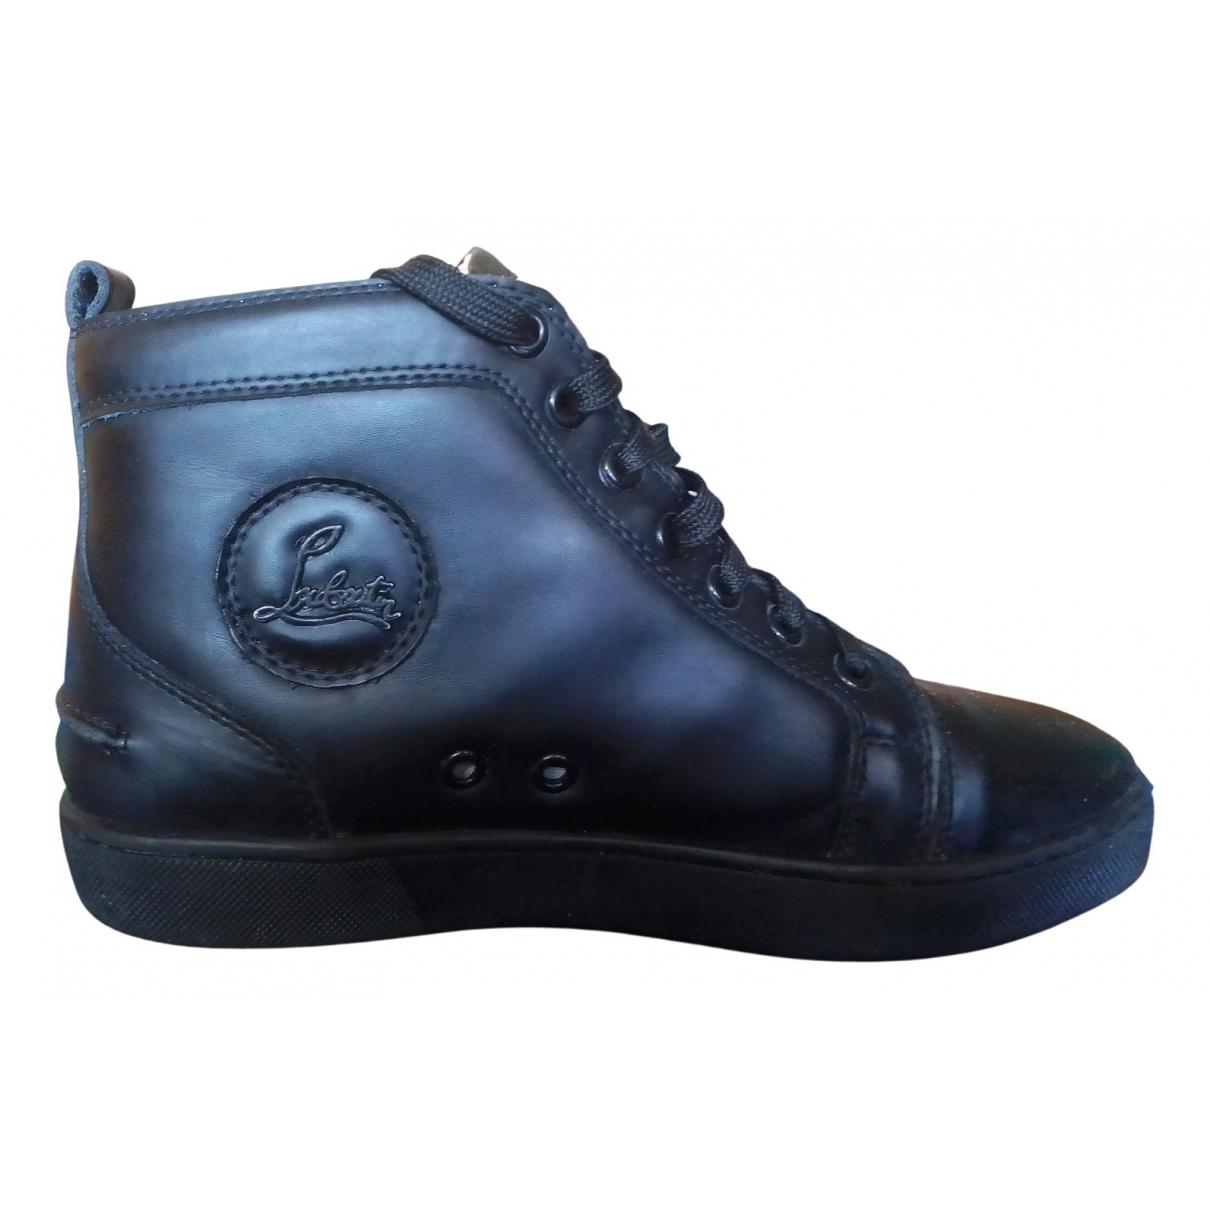 Christian Louboutin \N Sneakers in  Schwarz Lackleder